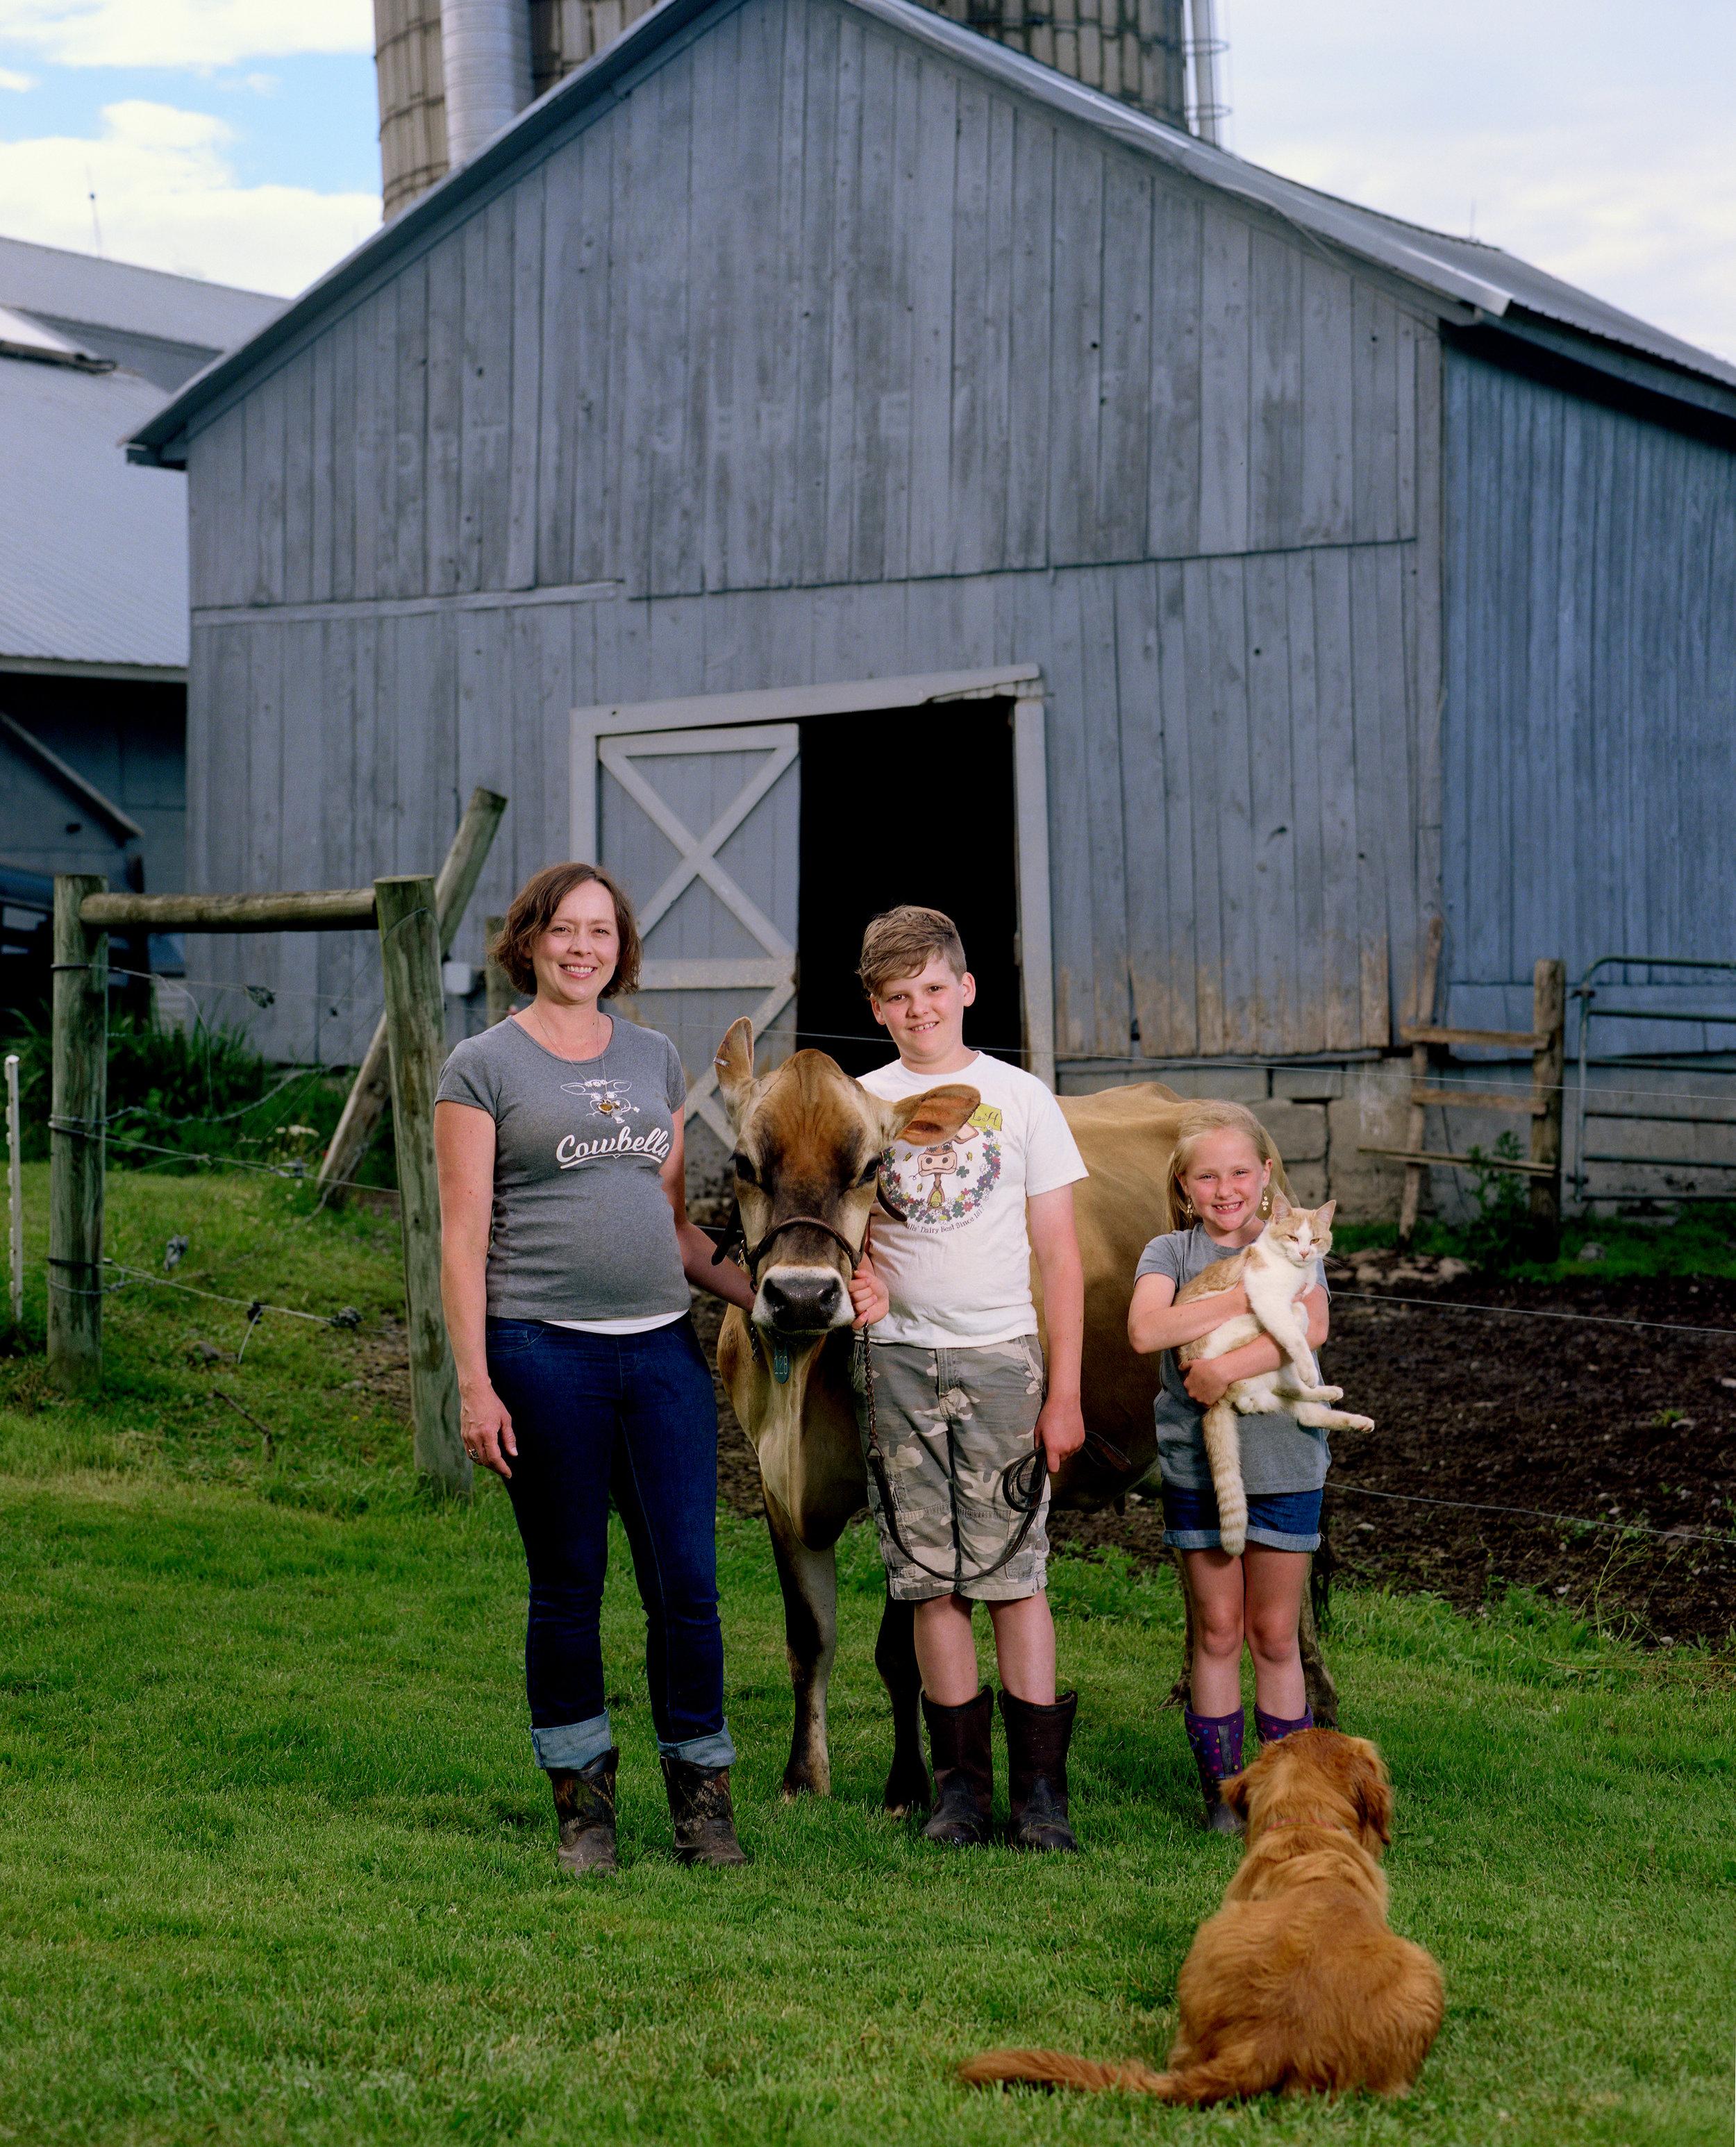 cowbella-mom-group_srgb.jpg